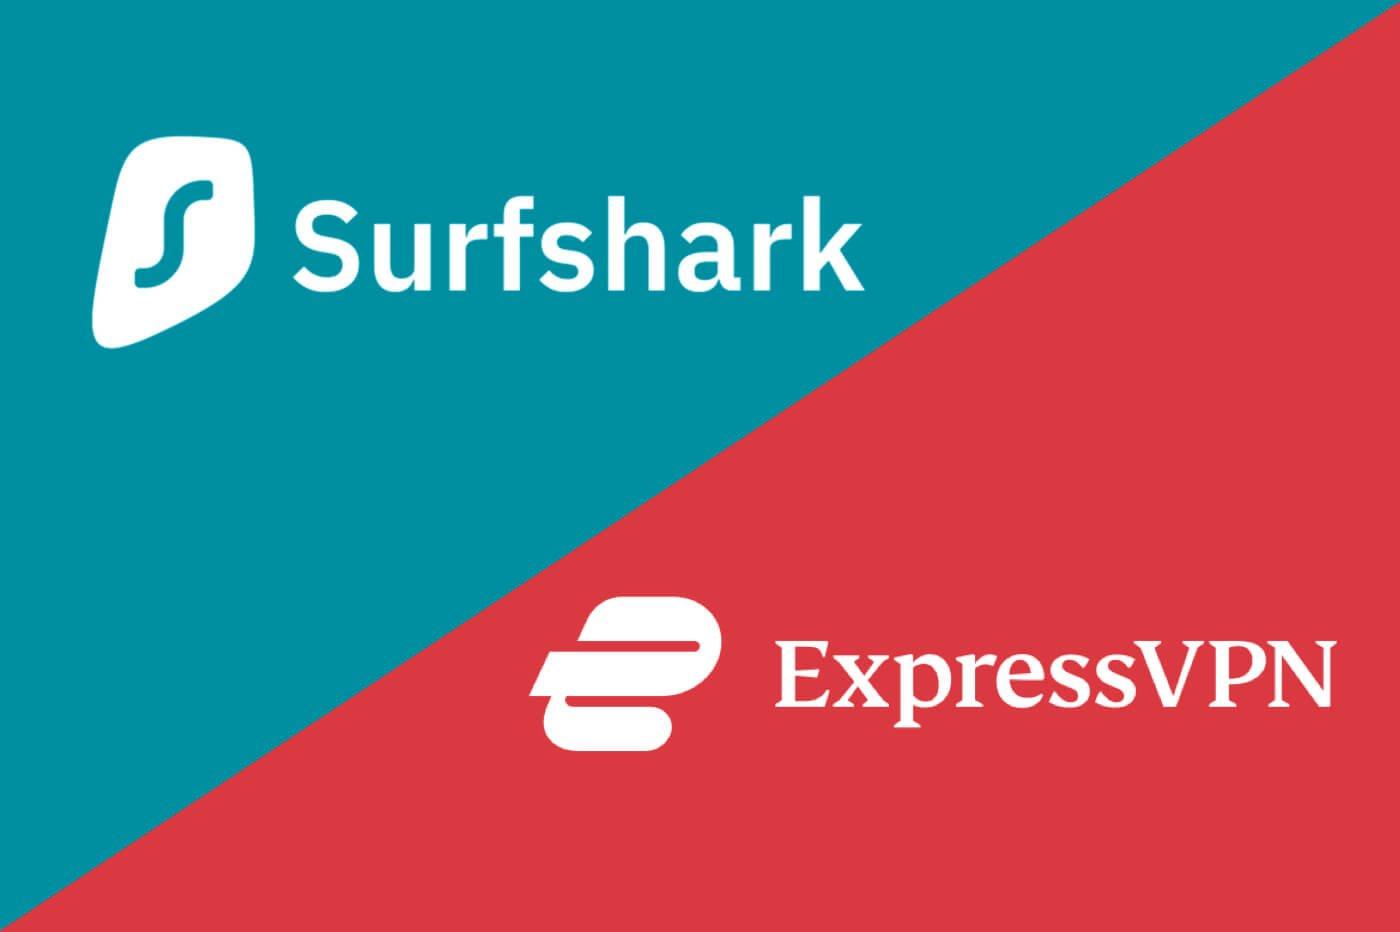 Surfshark-vs-ExpressVPN